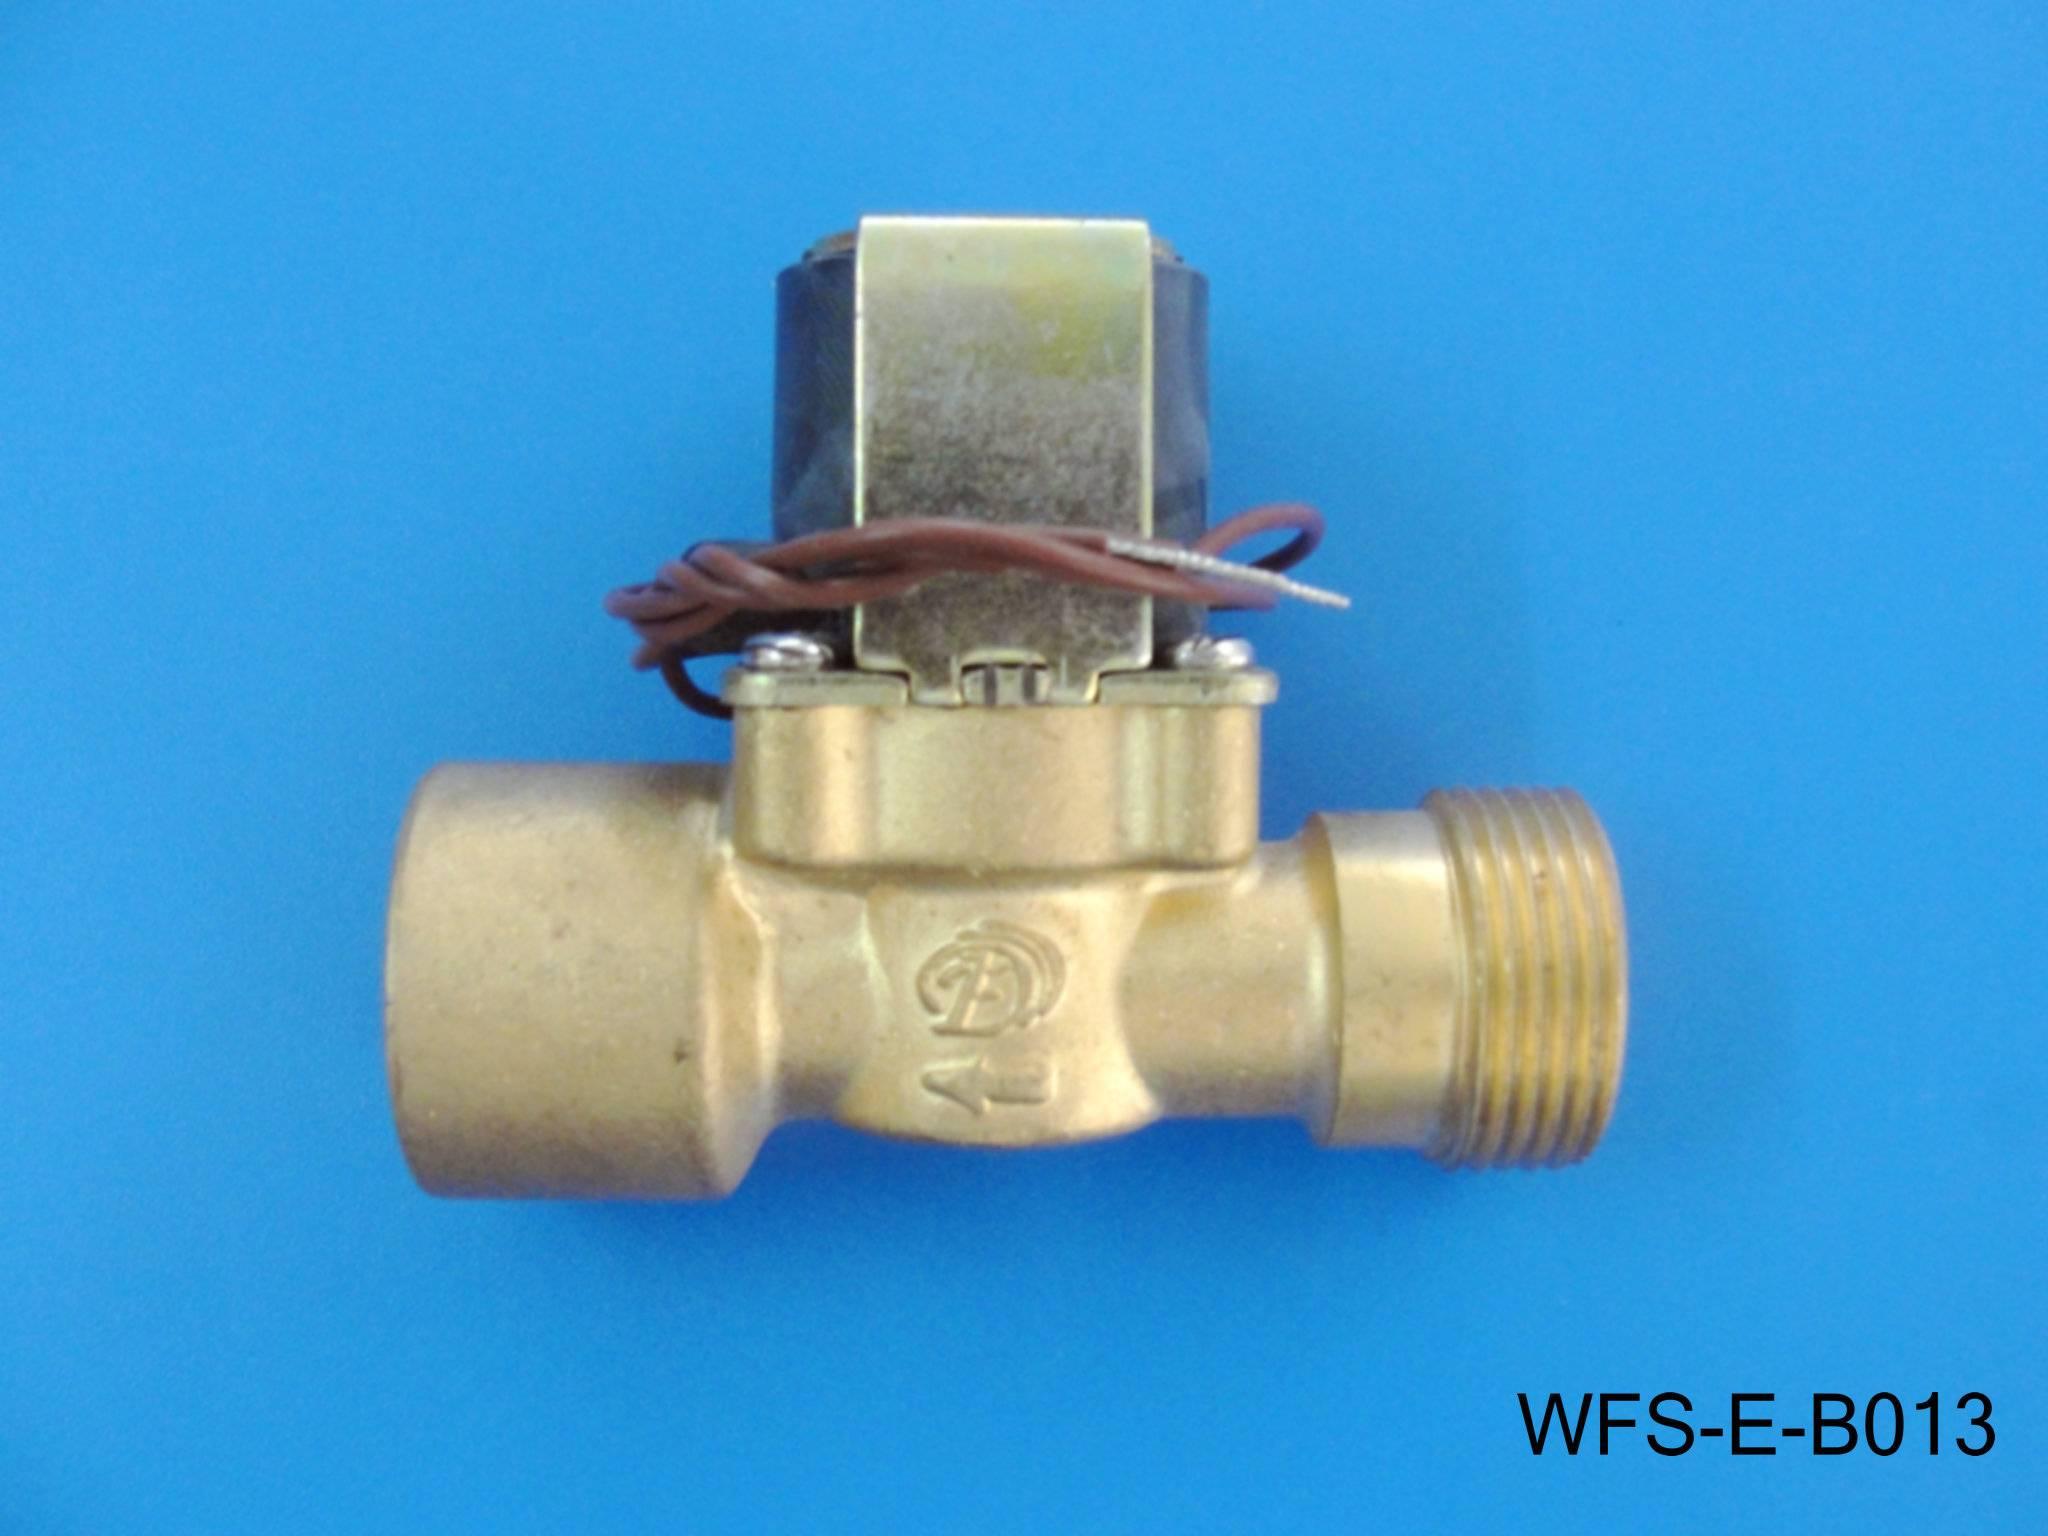 High temperature resistant all copper solenoid valve WFS-E-B013